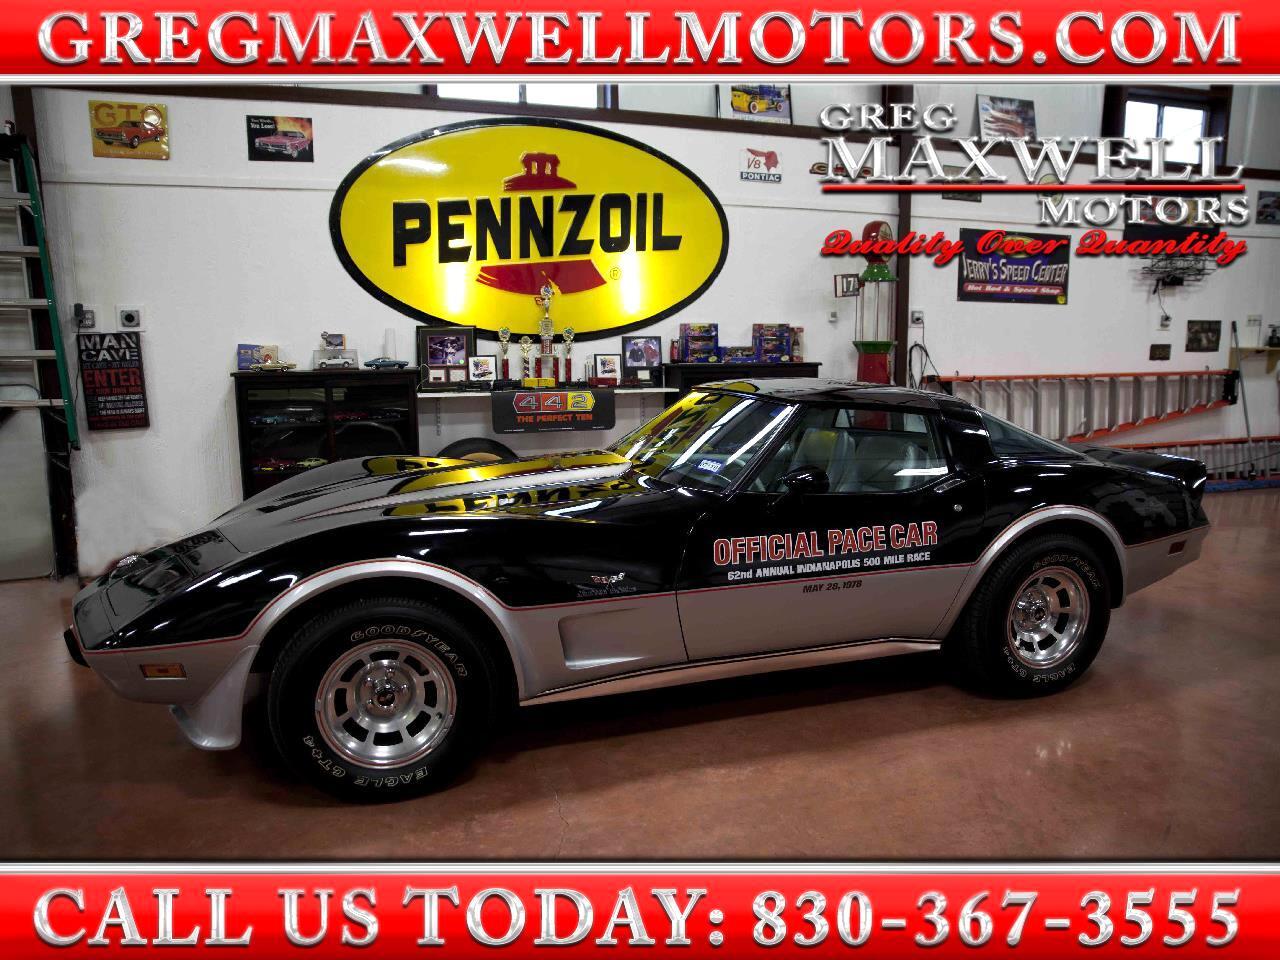 1978 Chevrolet Corvette Pacecar